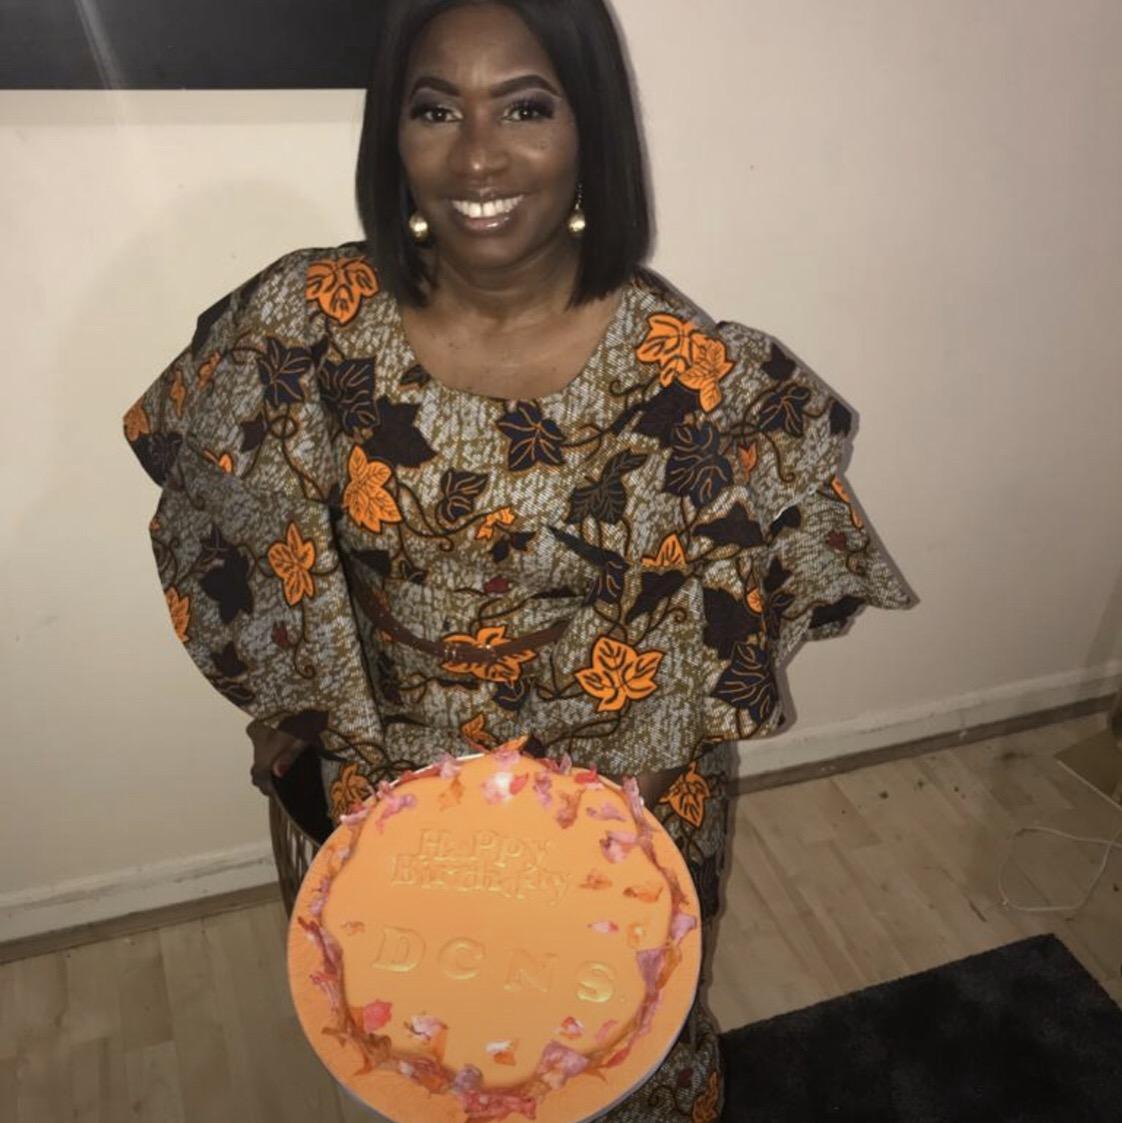 #blwhammersmith happy birthday dcns Roseline